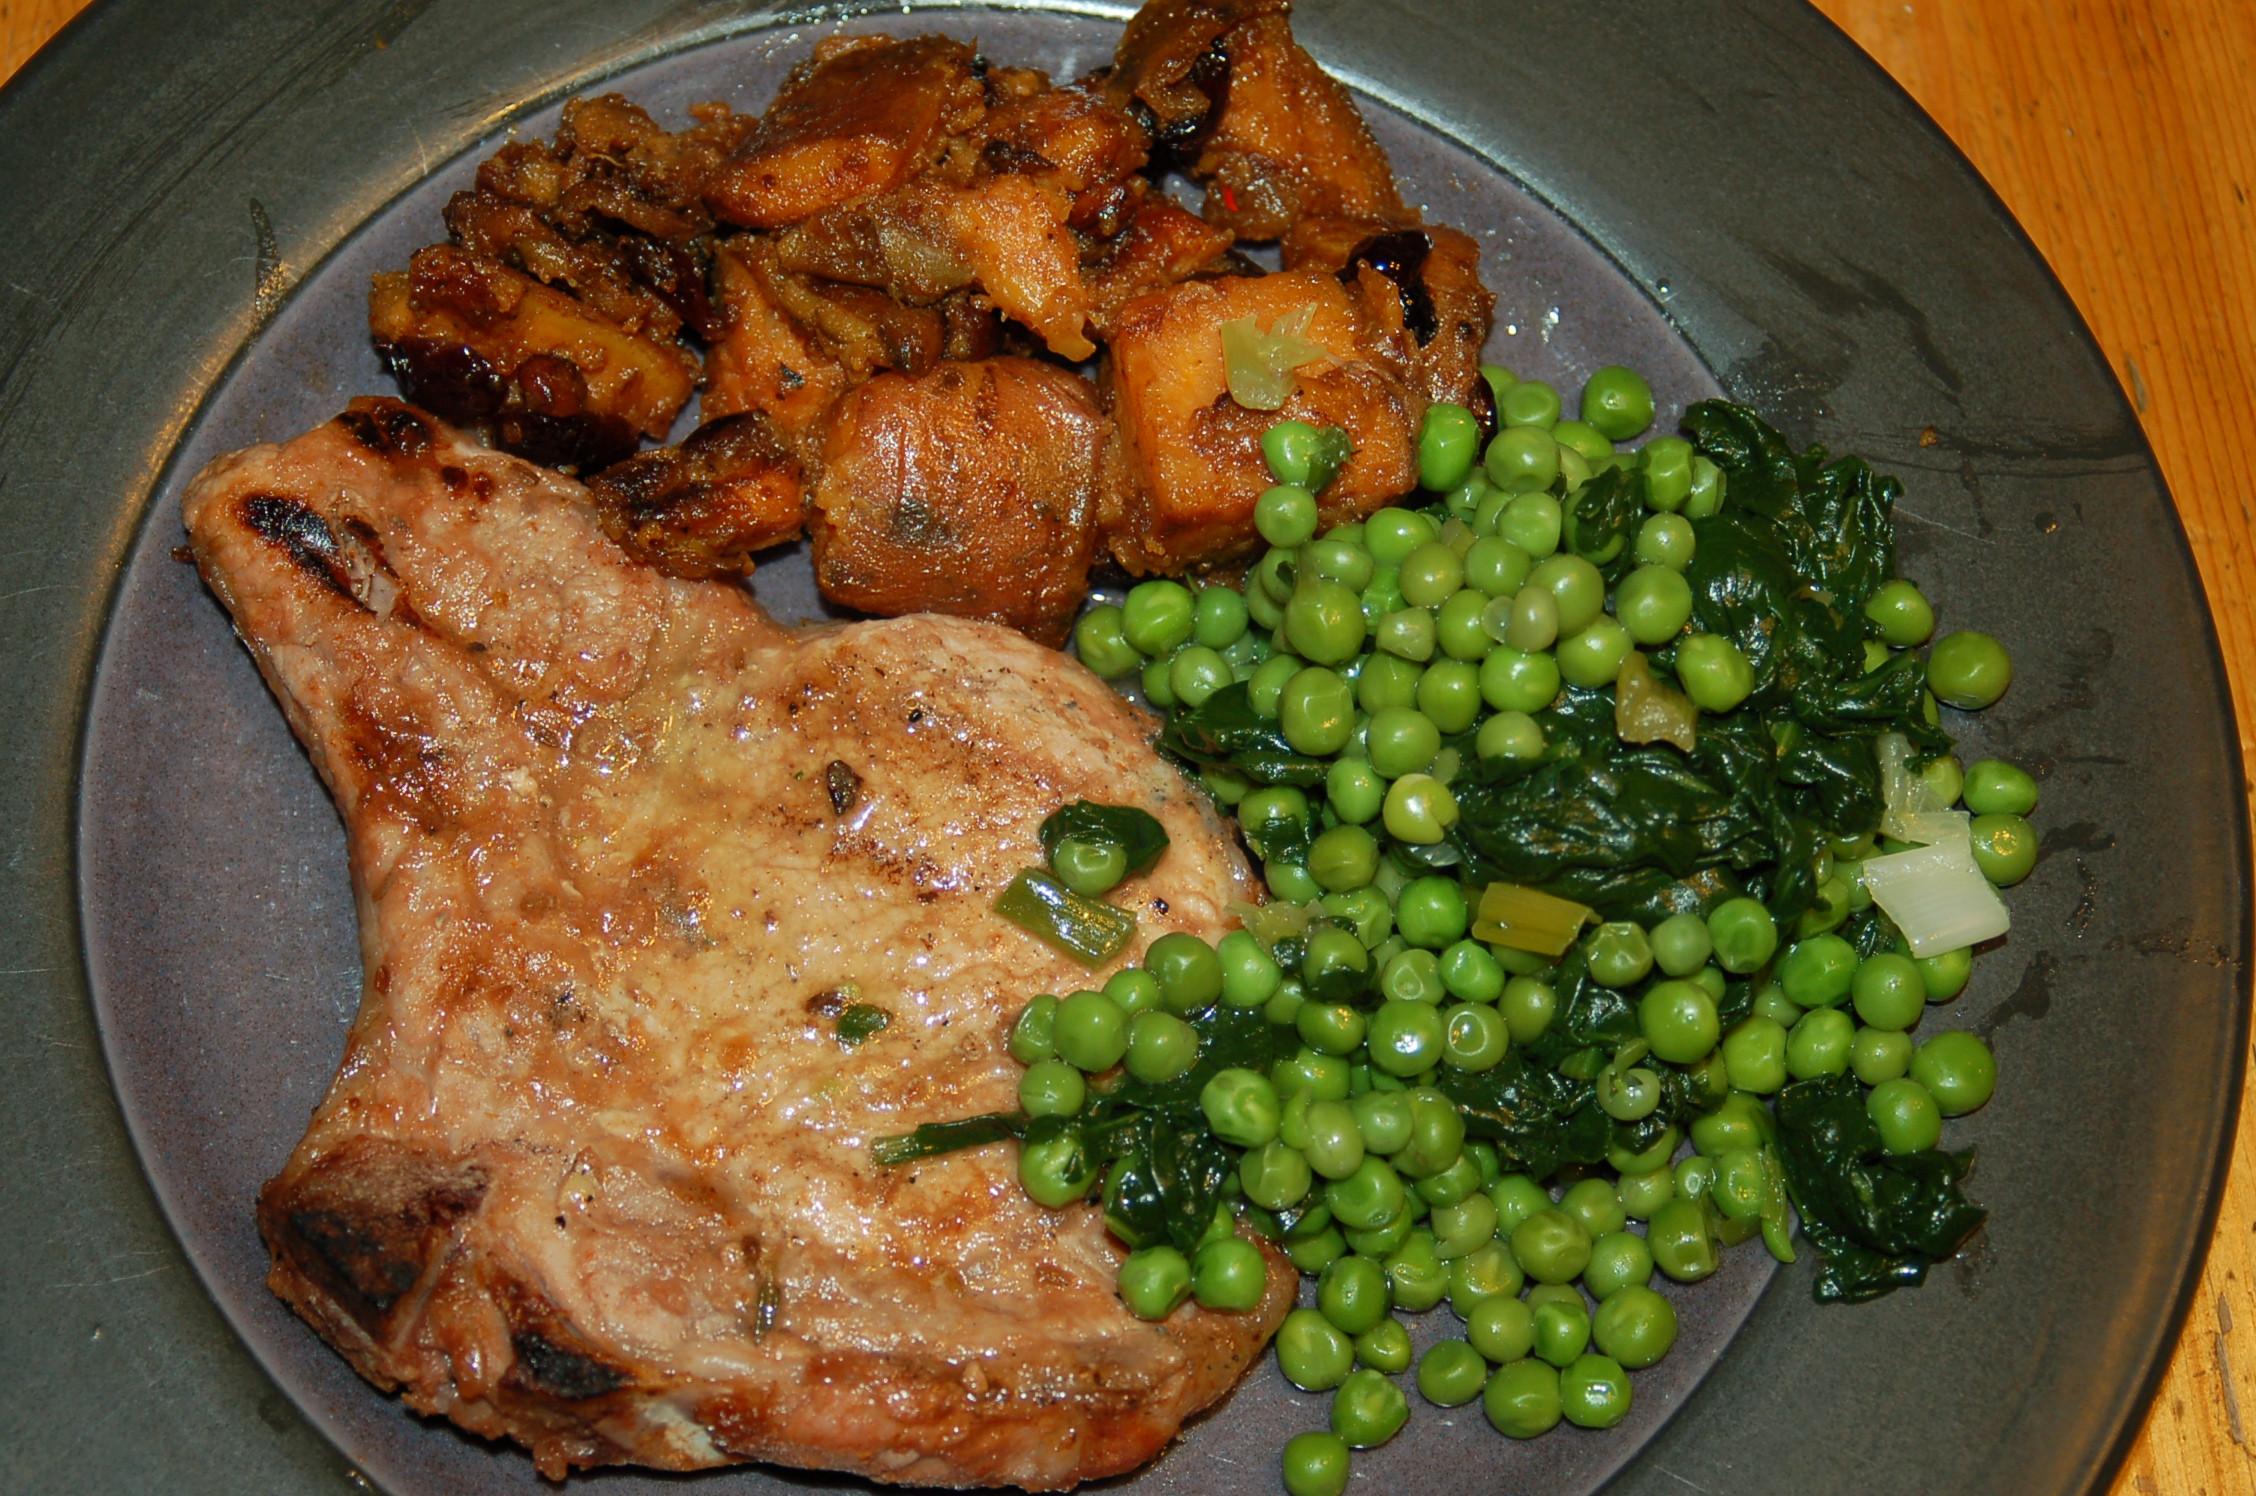 Pork Chop Side Dishes Recipes  20 Best Side Dishes for Pork Chops Best Recipes Ever